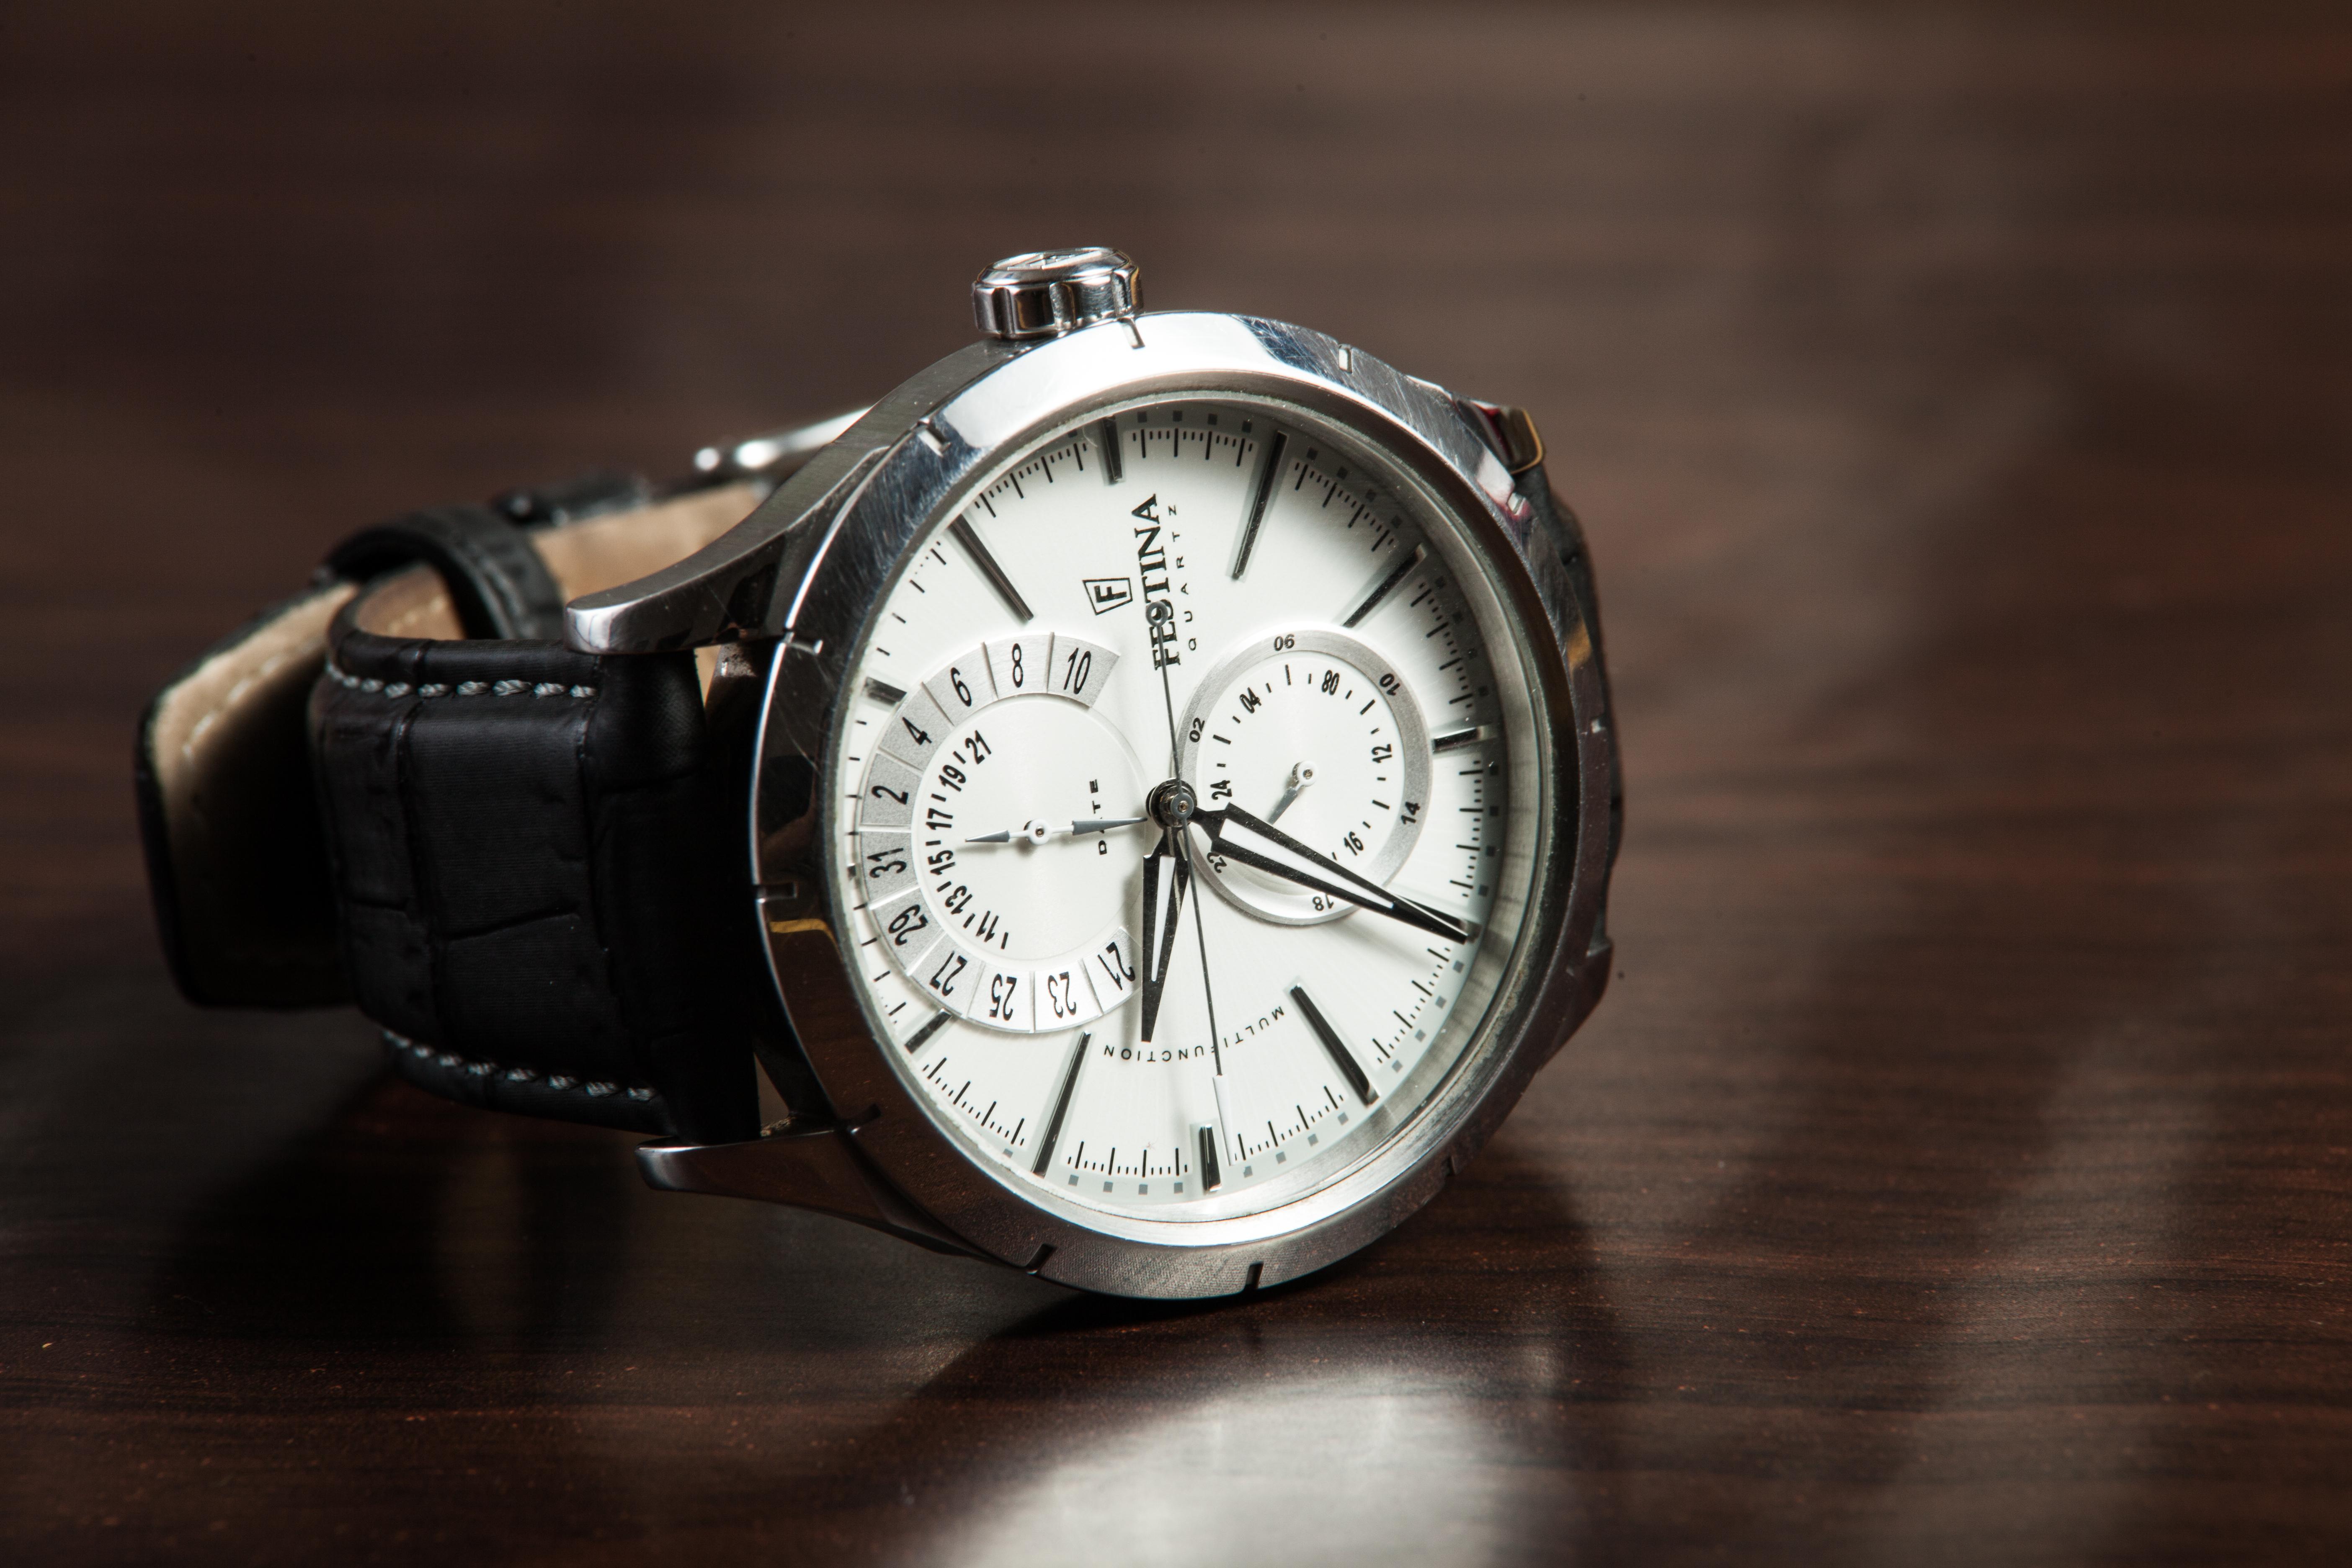 automatic watch, watch, wristwatch, men's style, men's fashion, menswear, men's wardrobe essentials, wardrobe essentials